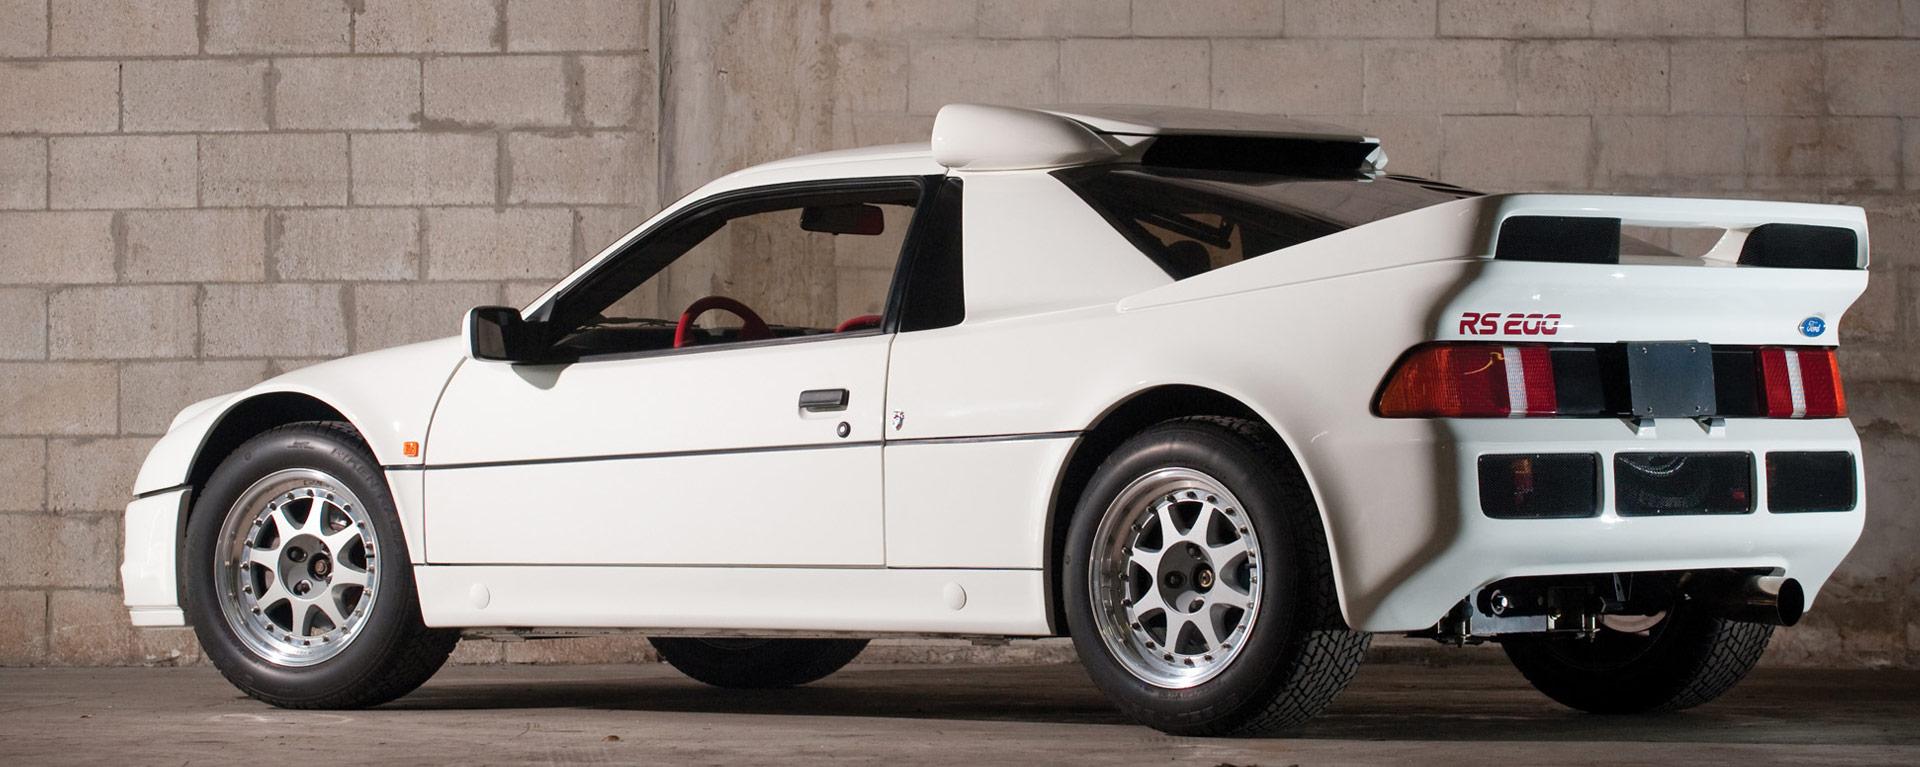 rs200 car